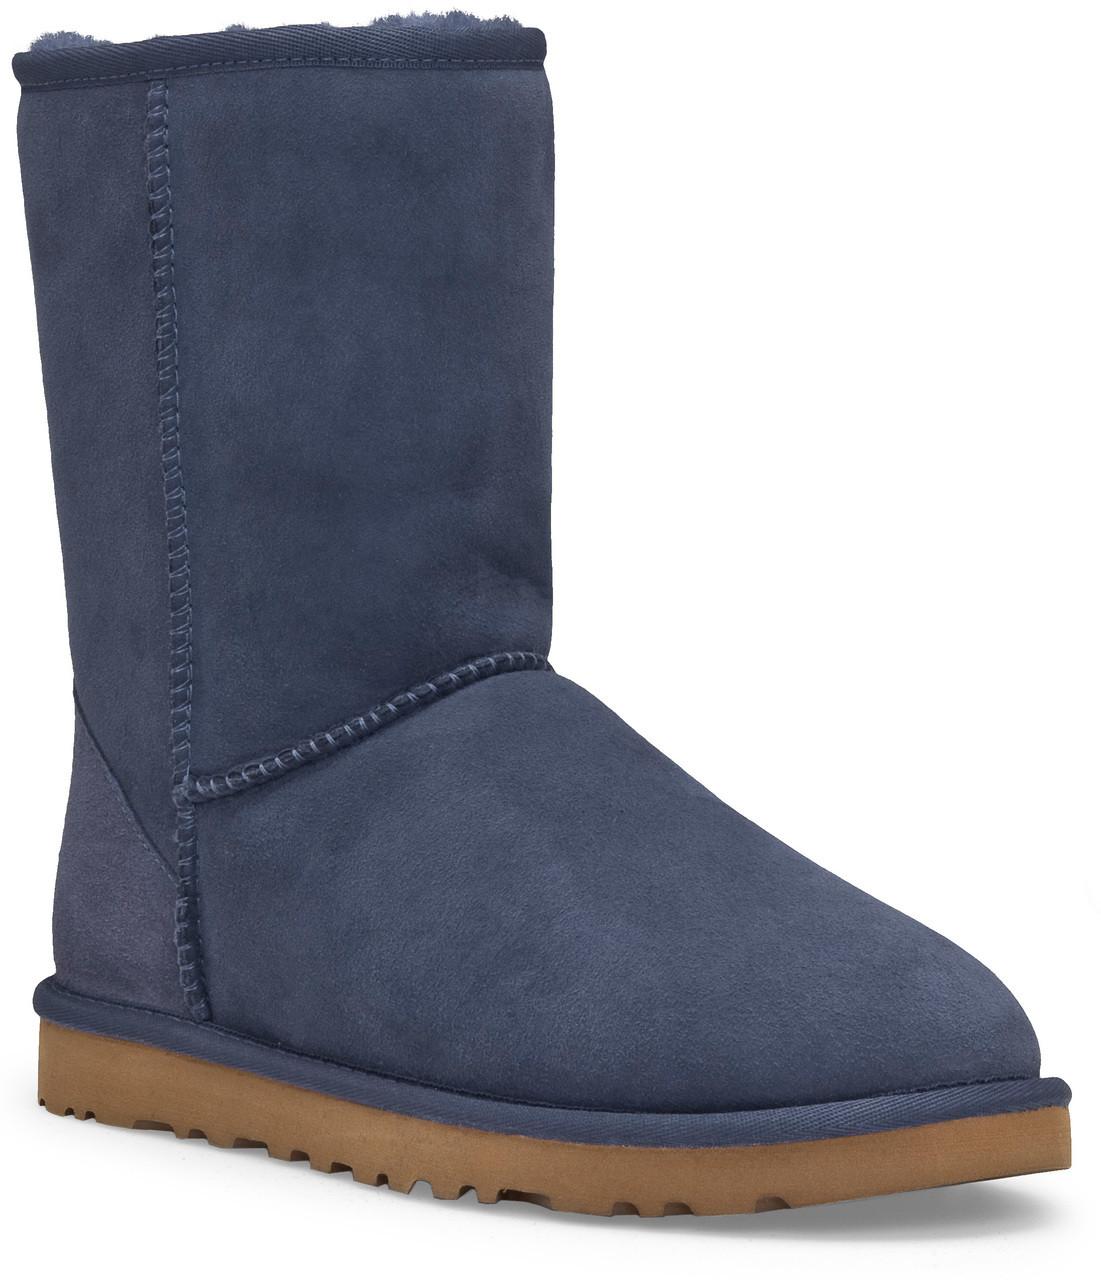 ugg women s classic short free shipping free returns ugg rh englinsfinefootwear com